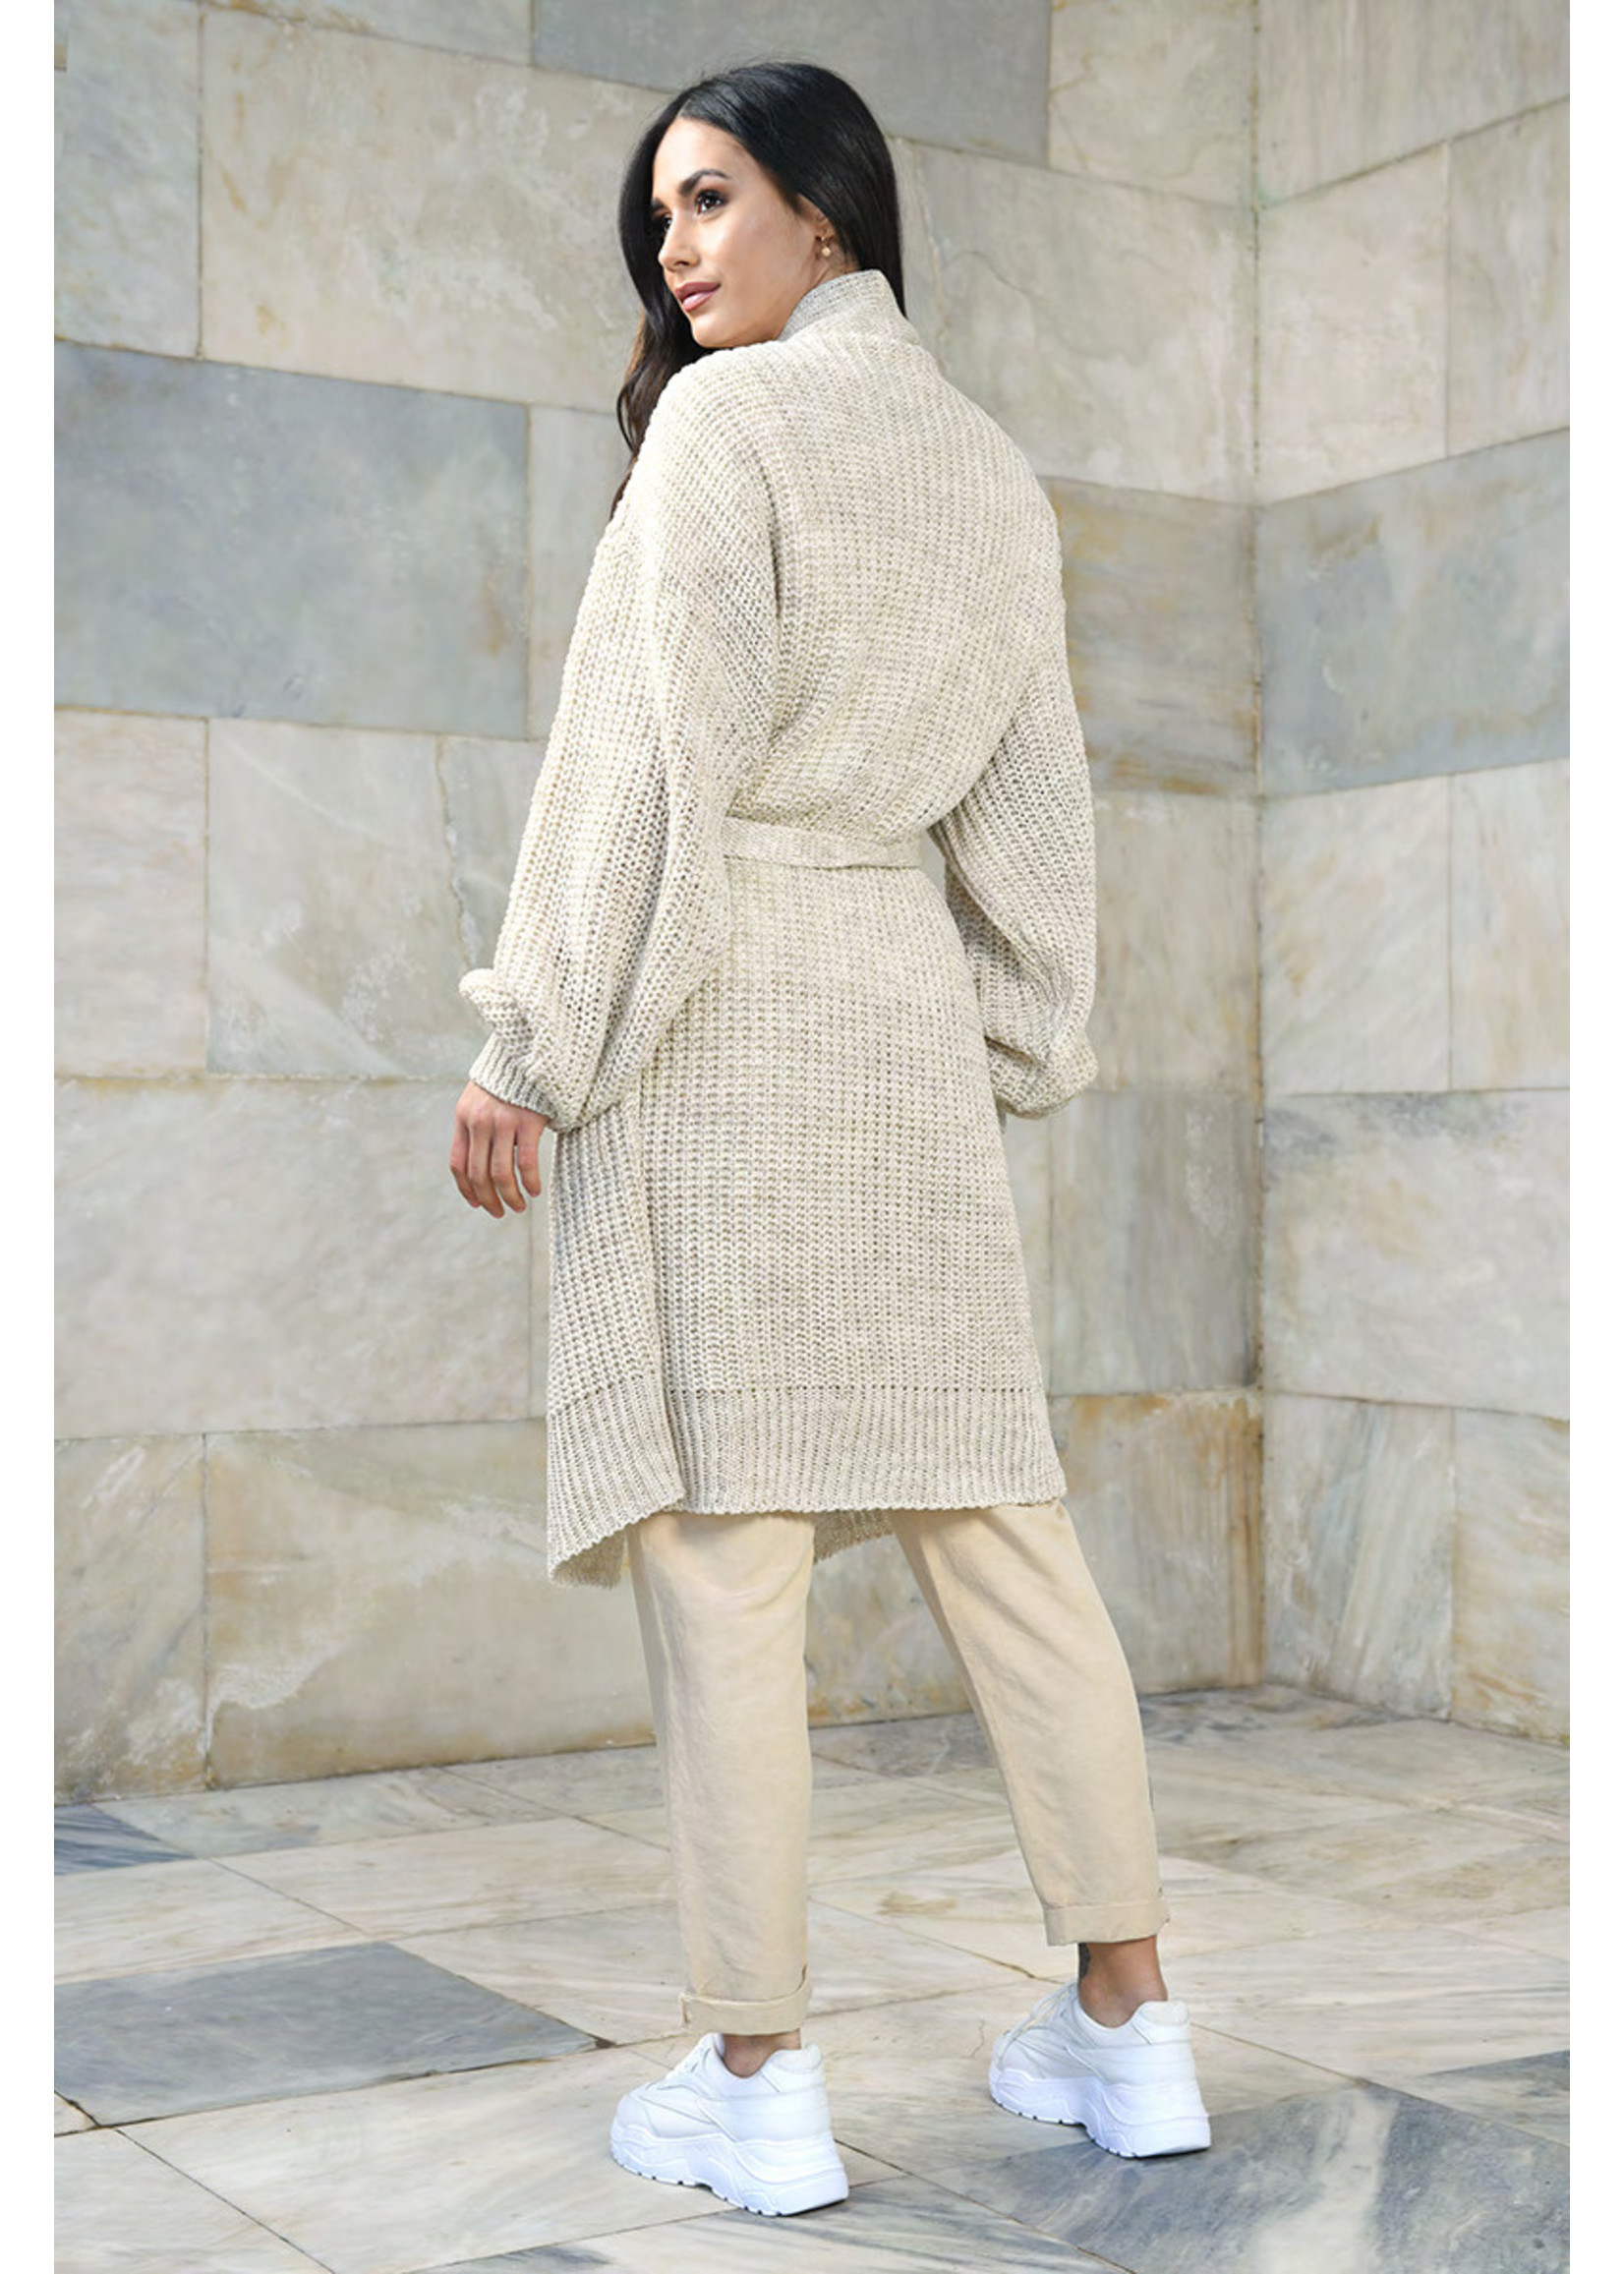 Vitesi Over Size Shaker knit Belted Sweater